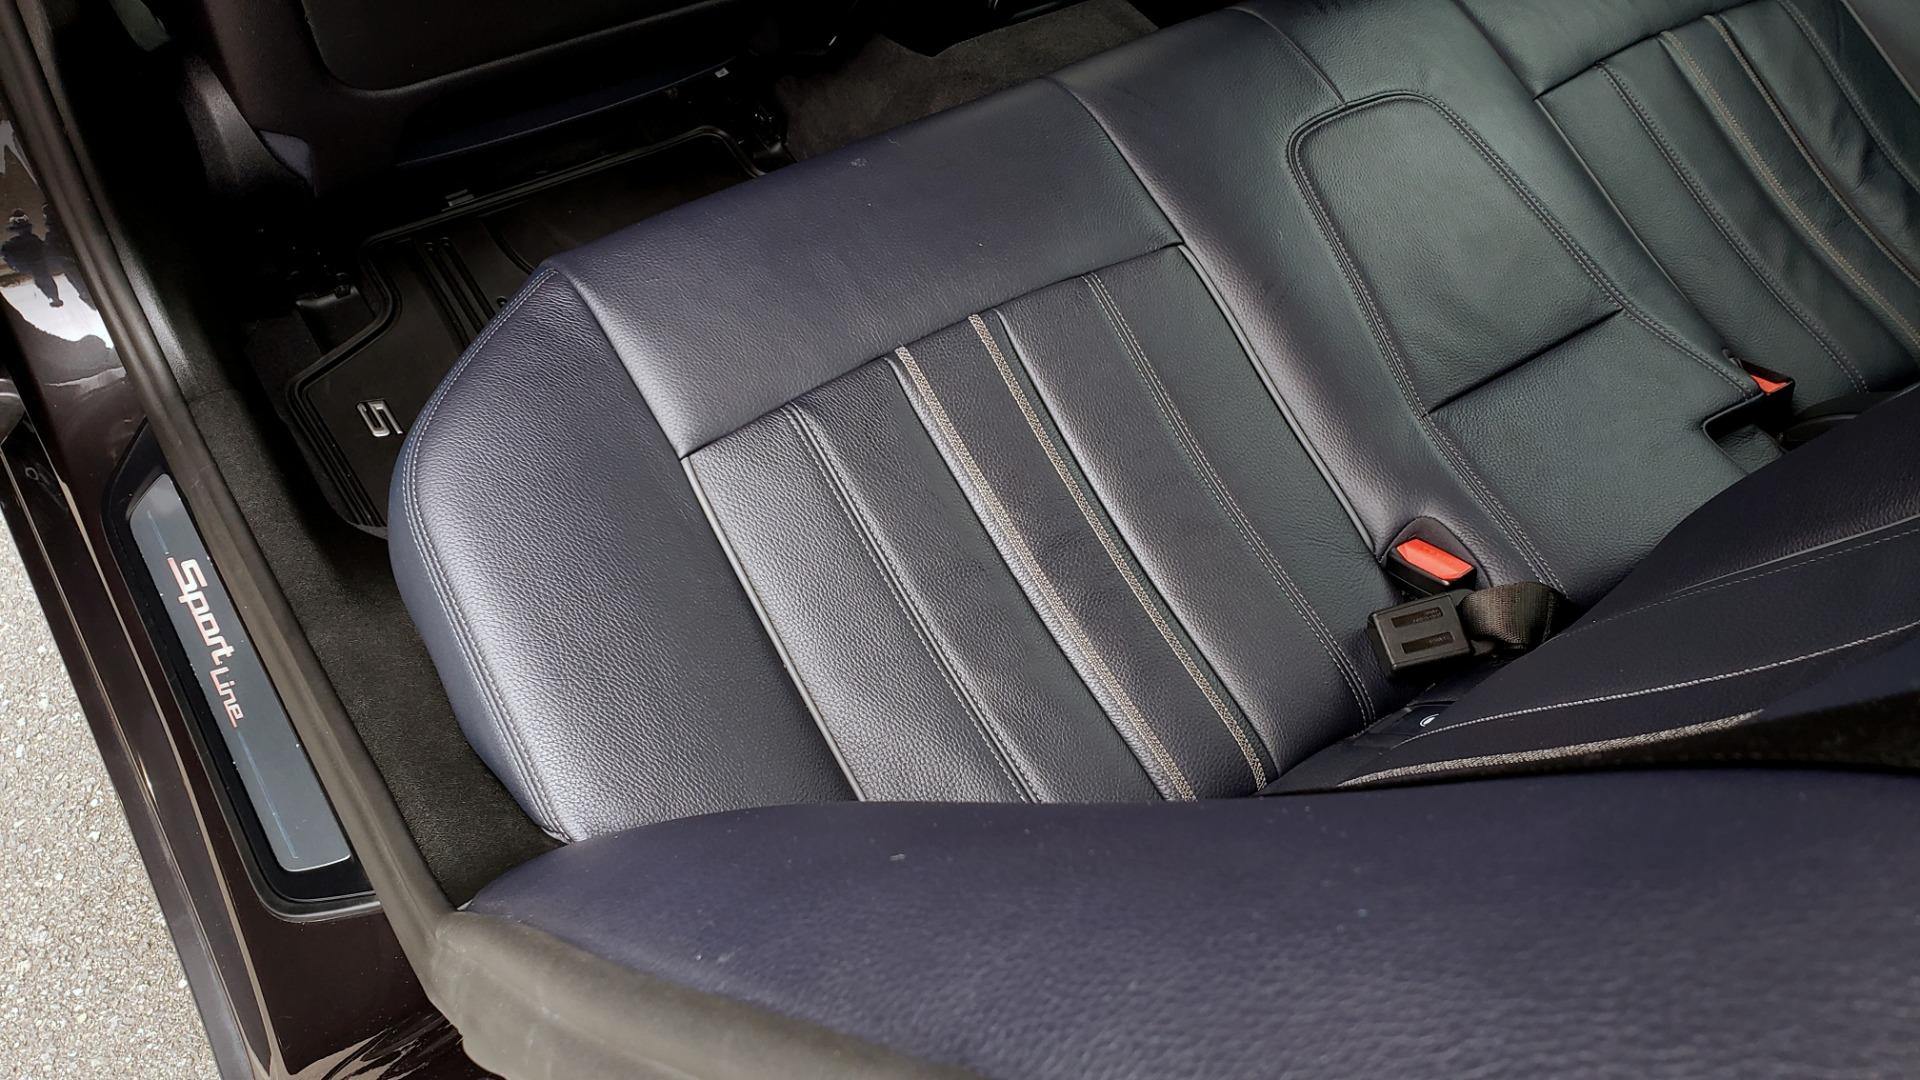 Used 2017 BMW 5 SERIES 530IXDRIVE / PREM PKG / DRVR ASST PLUS / CLD WTHR / APPLE CARPLAY for sale Sold at Formula Imports in Charlotte NC 28227 61